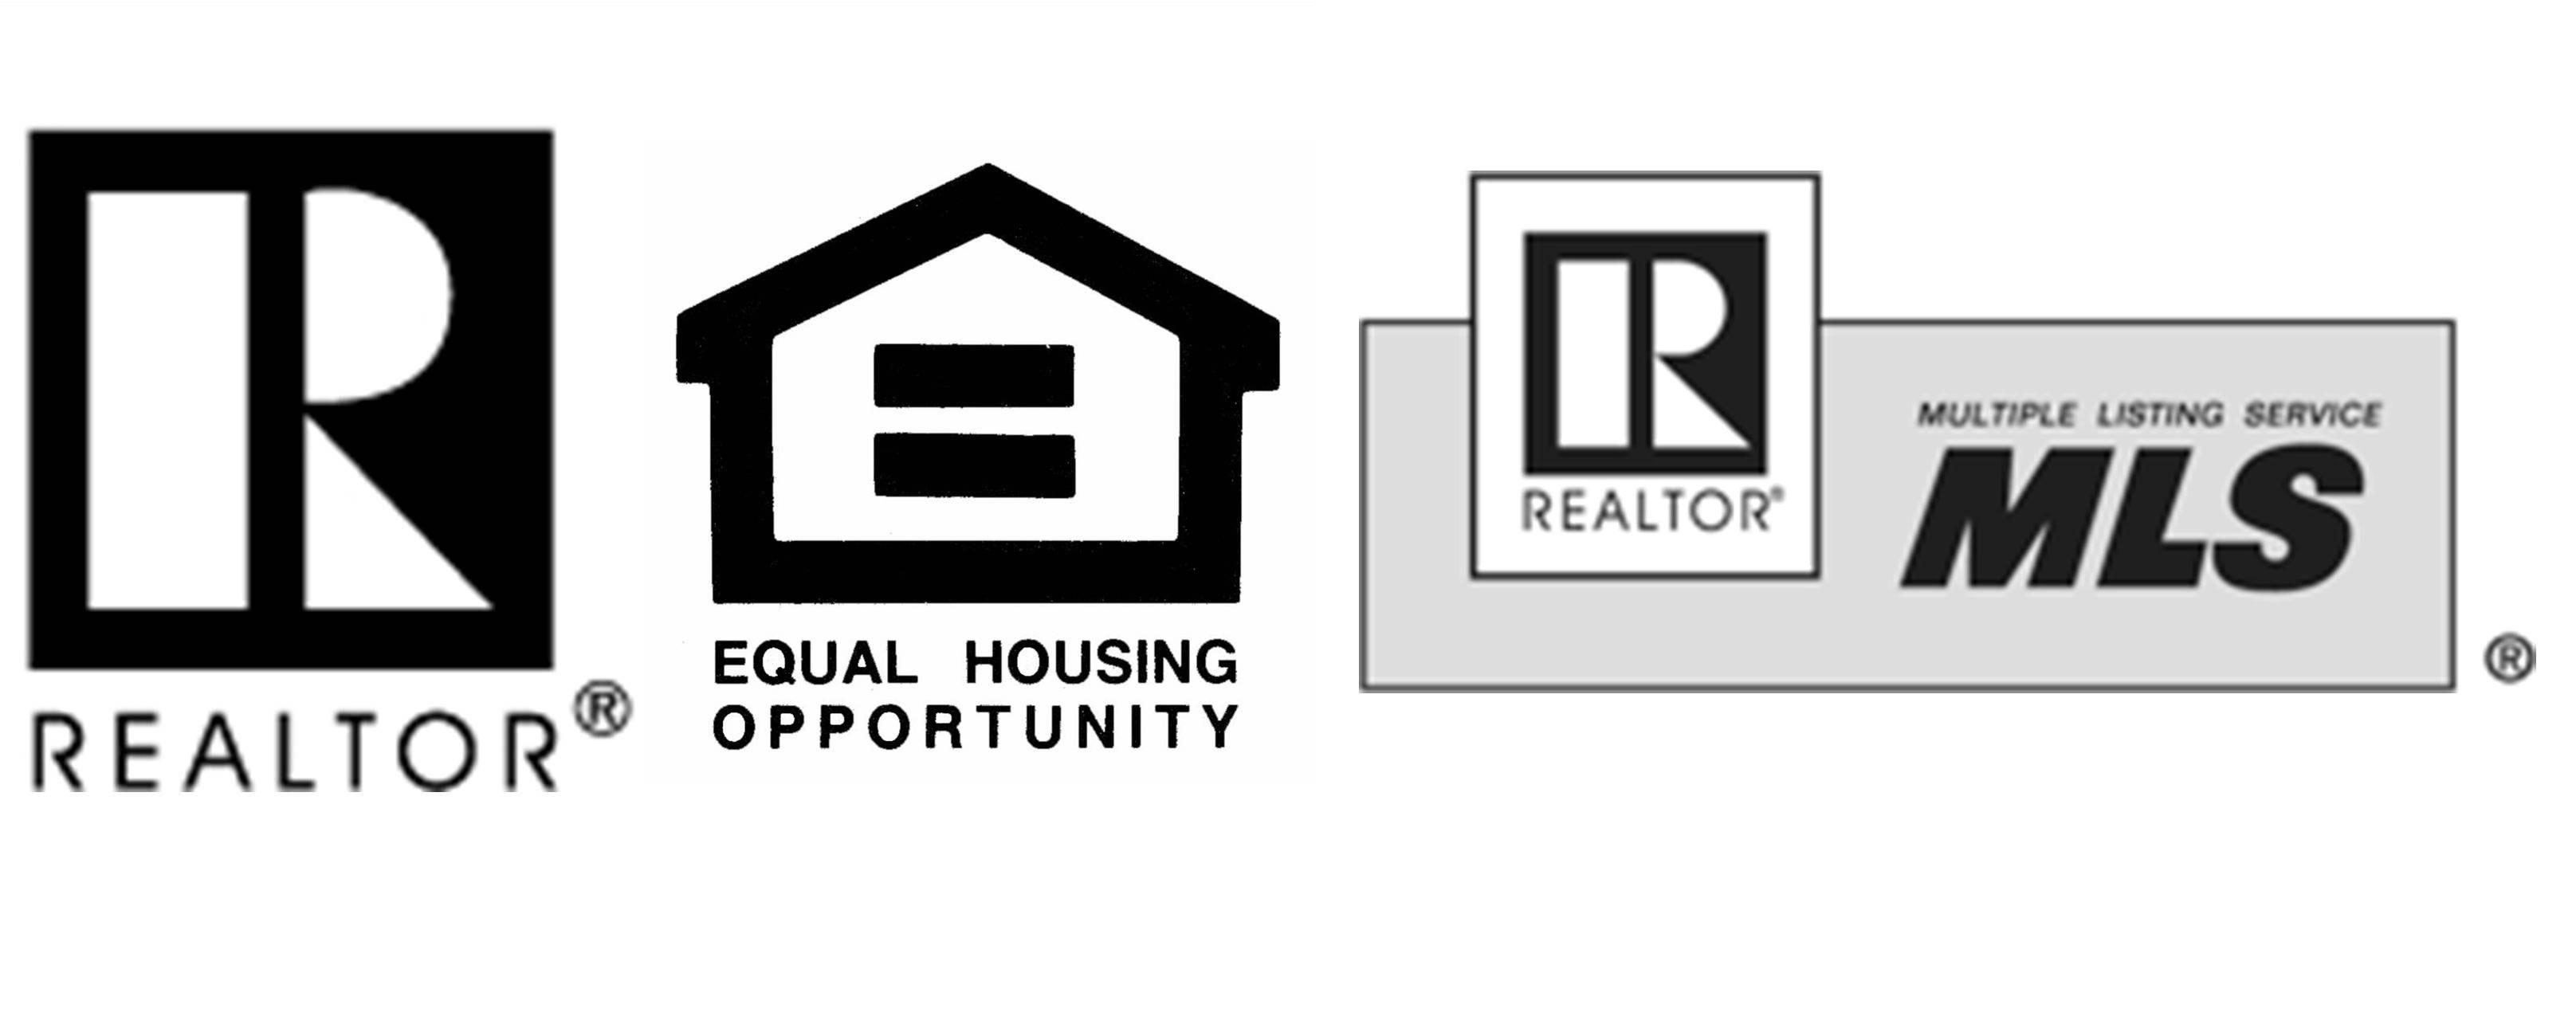 AZ Flat Fee Listing Realtor Phoenix Yuma AZ Real Estate